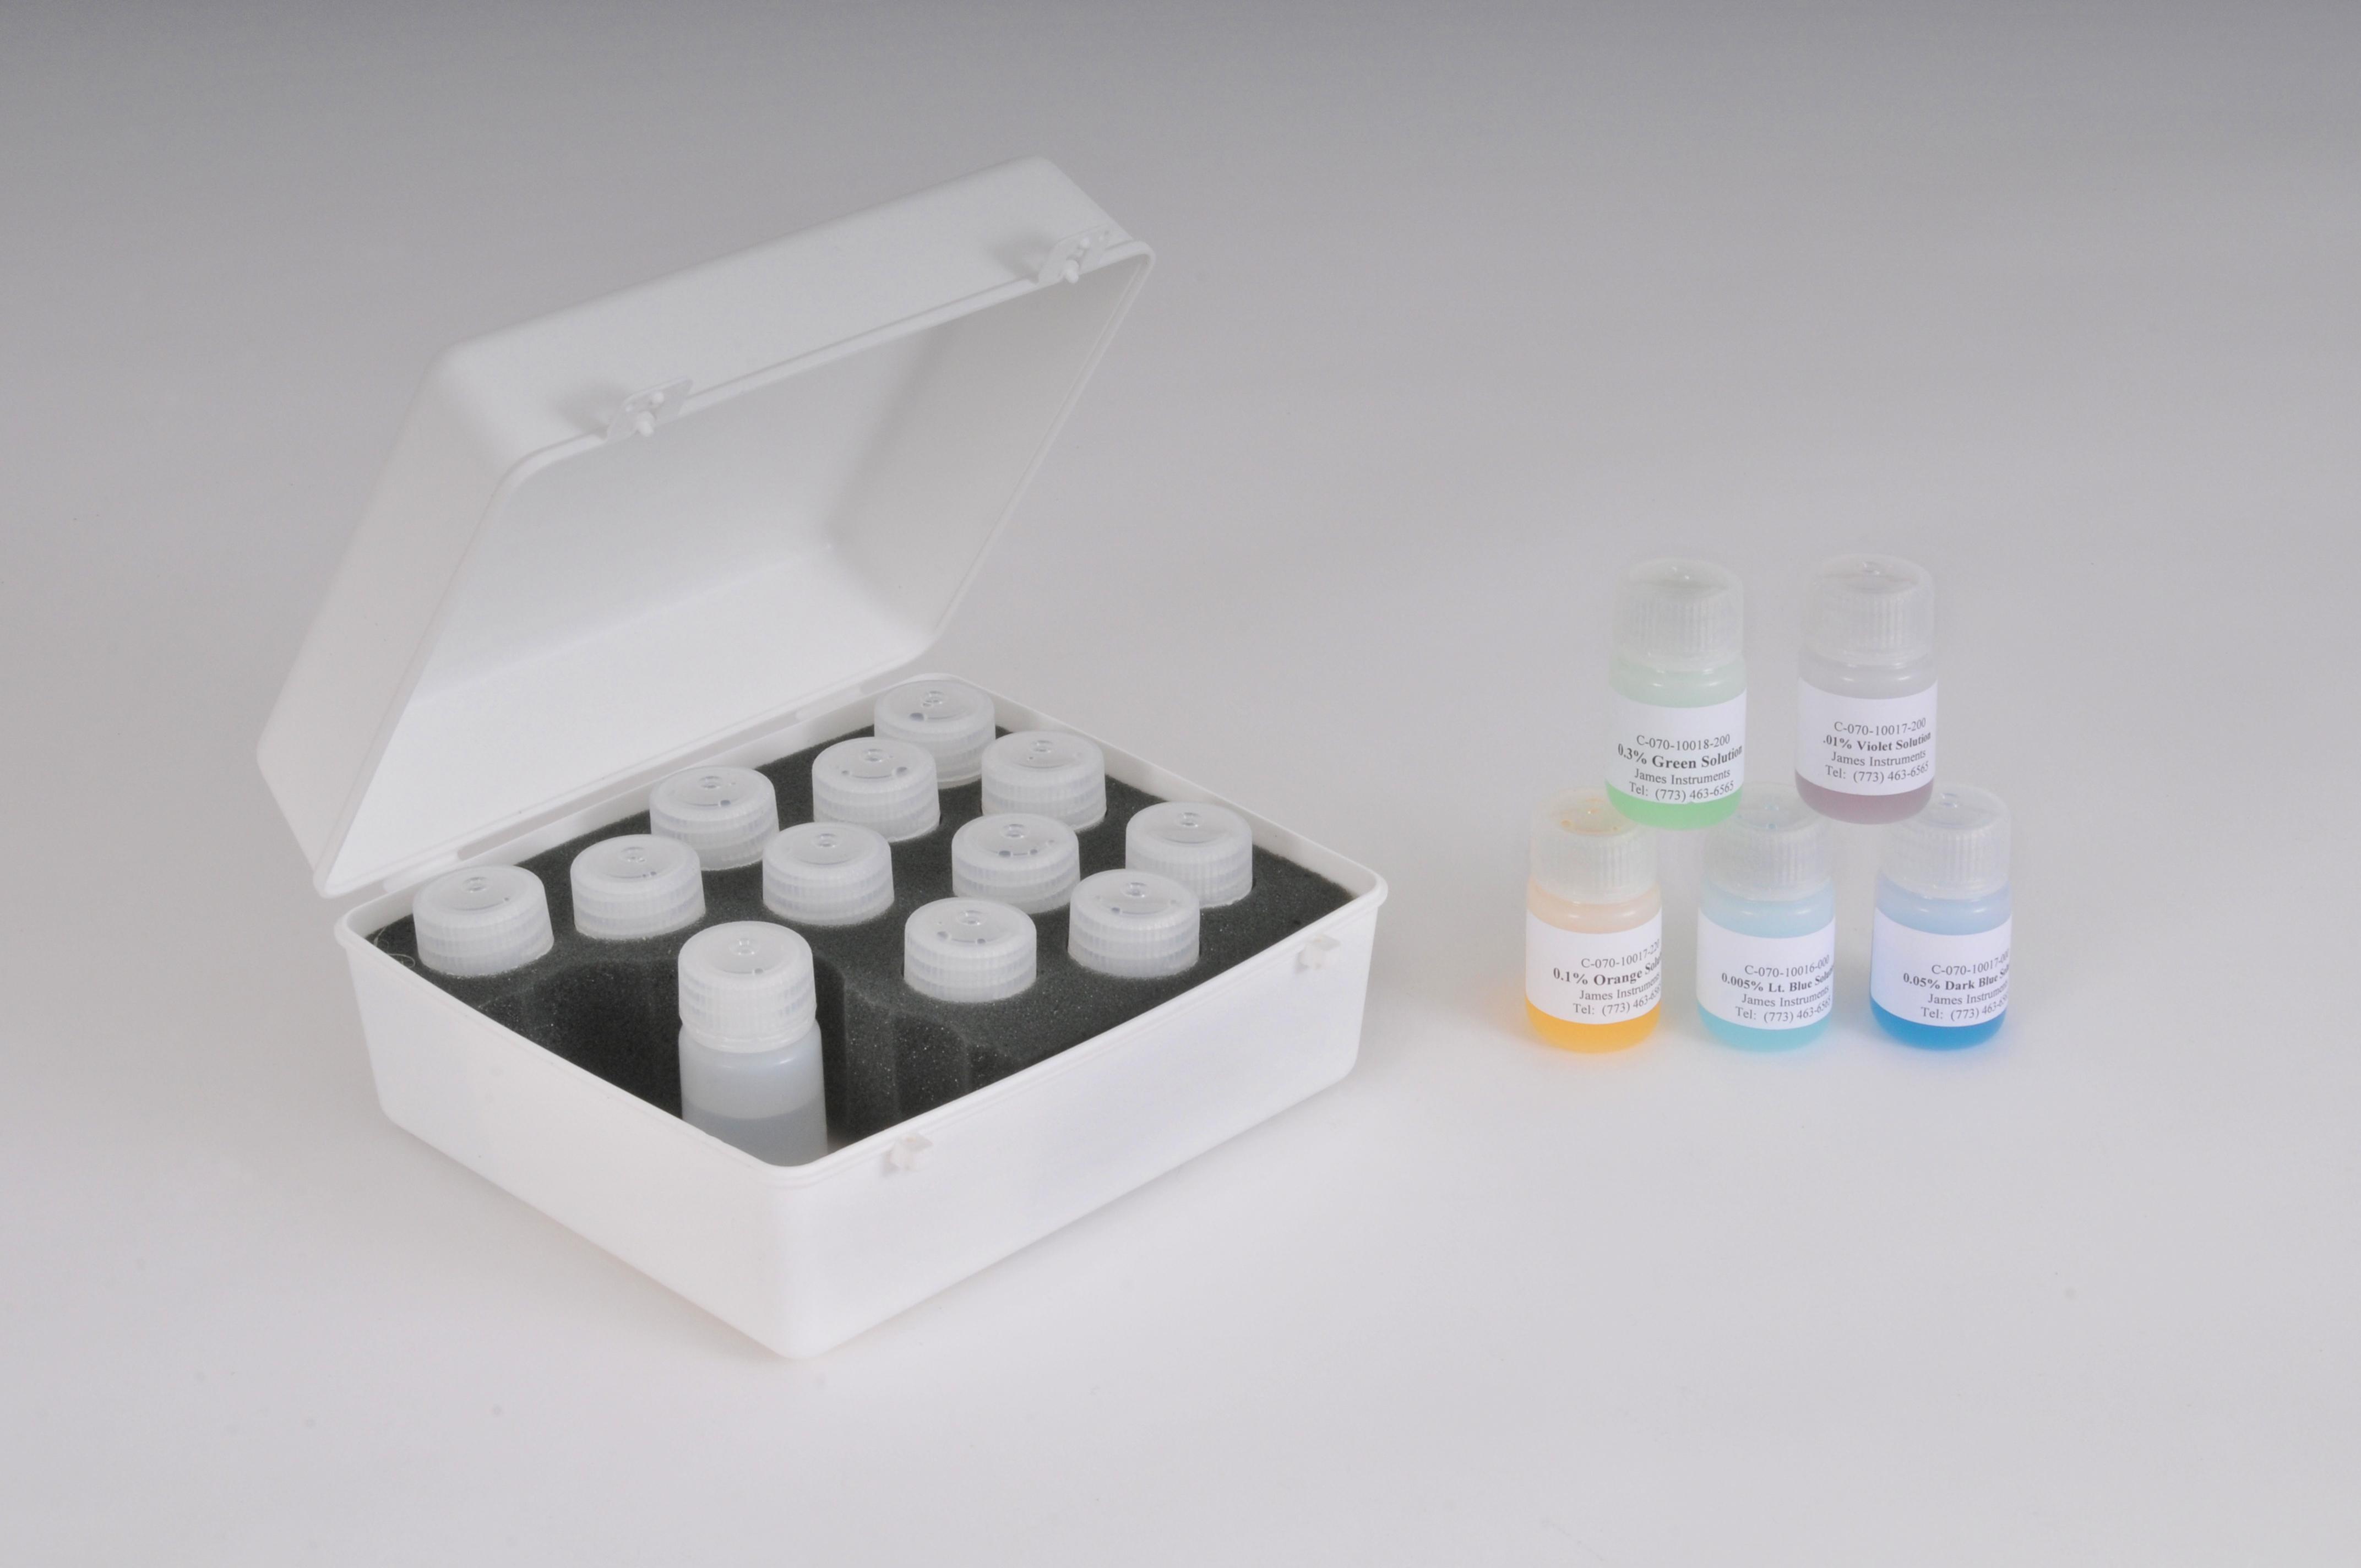 Chlorimeter Extraction Liquids